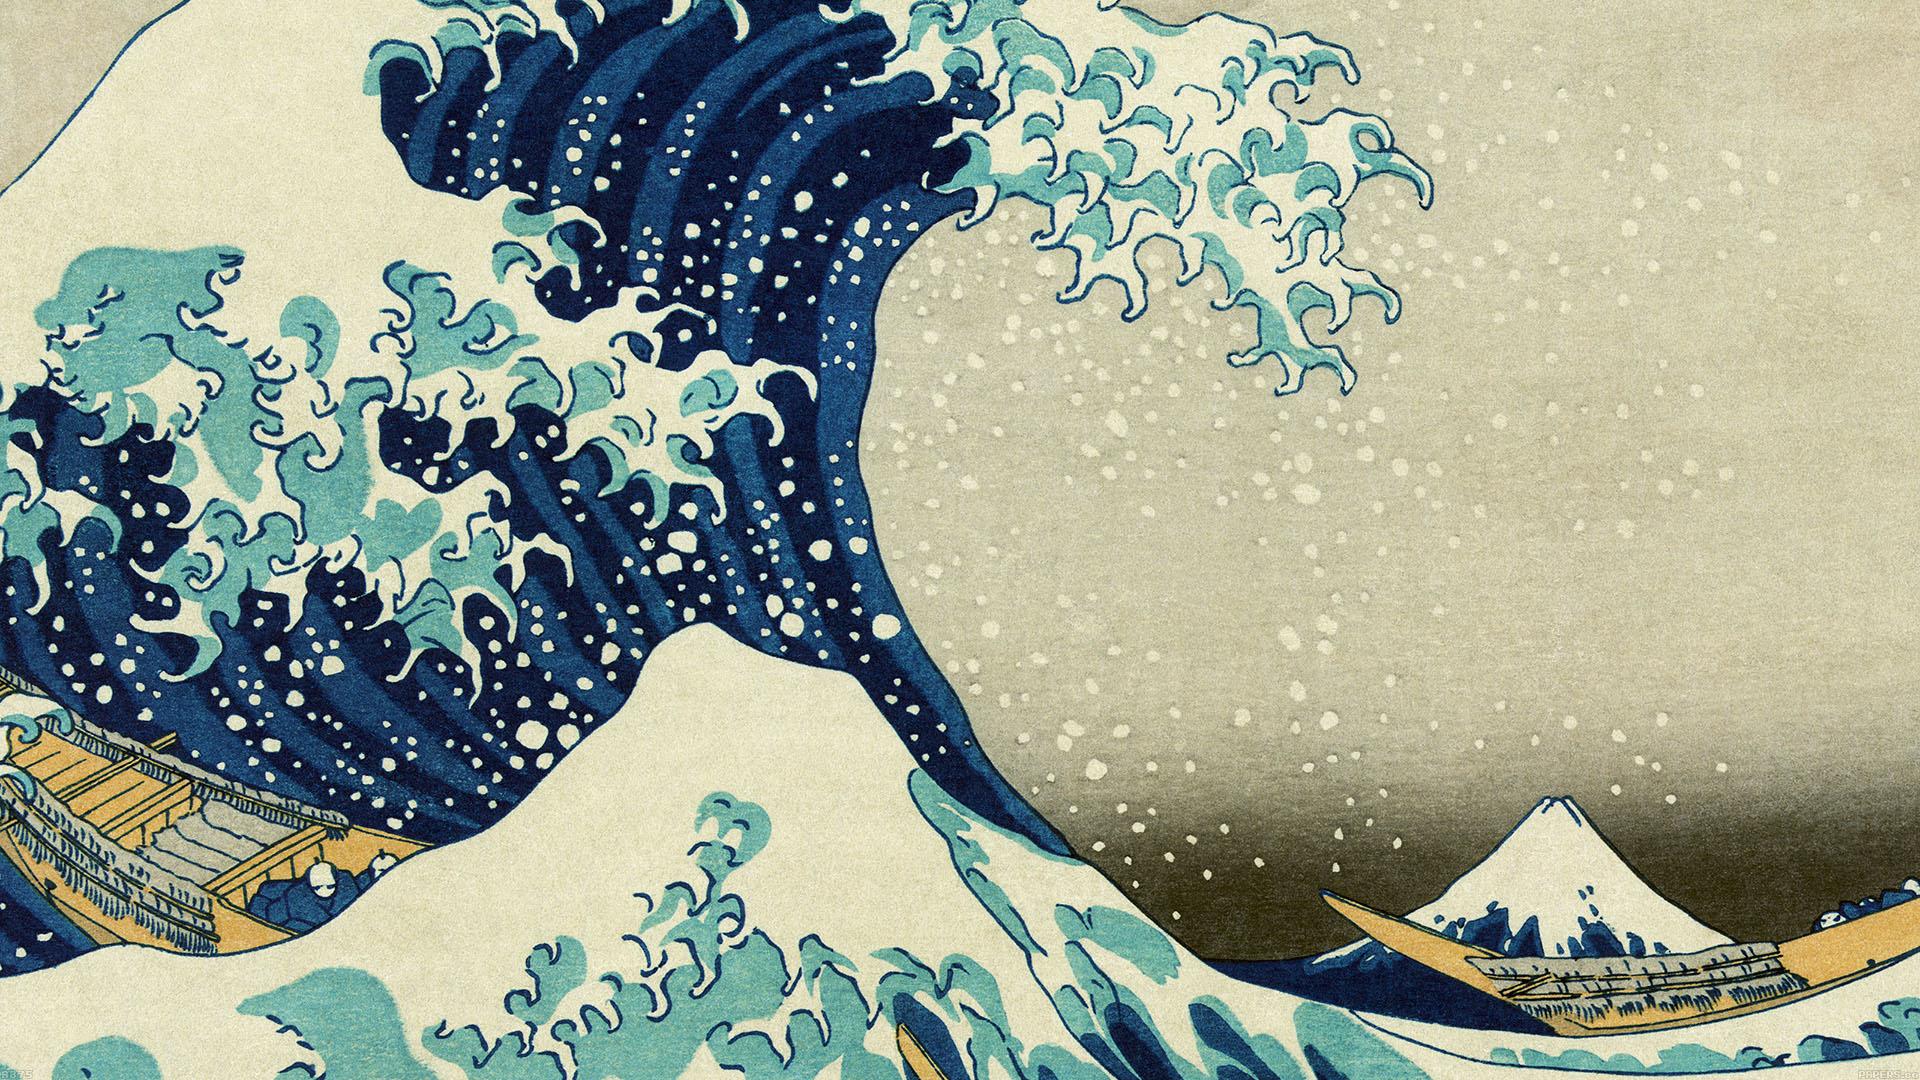 The Great Wave Off Kanagawa Hd Wallpaper 2560 X 1600